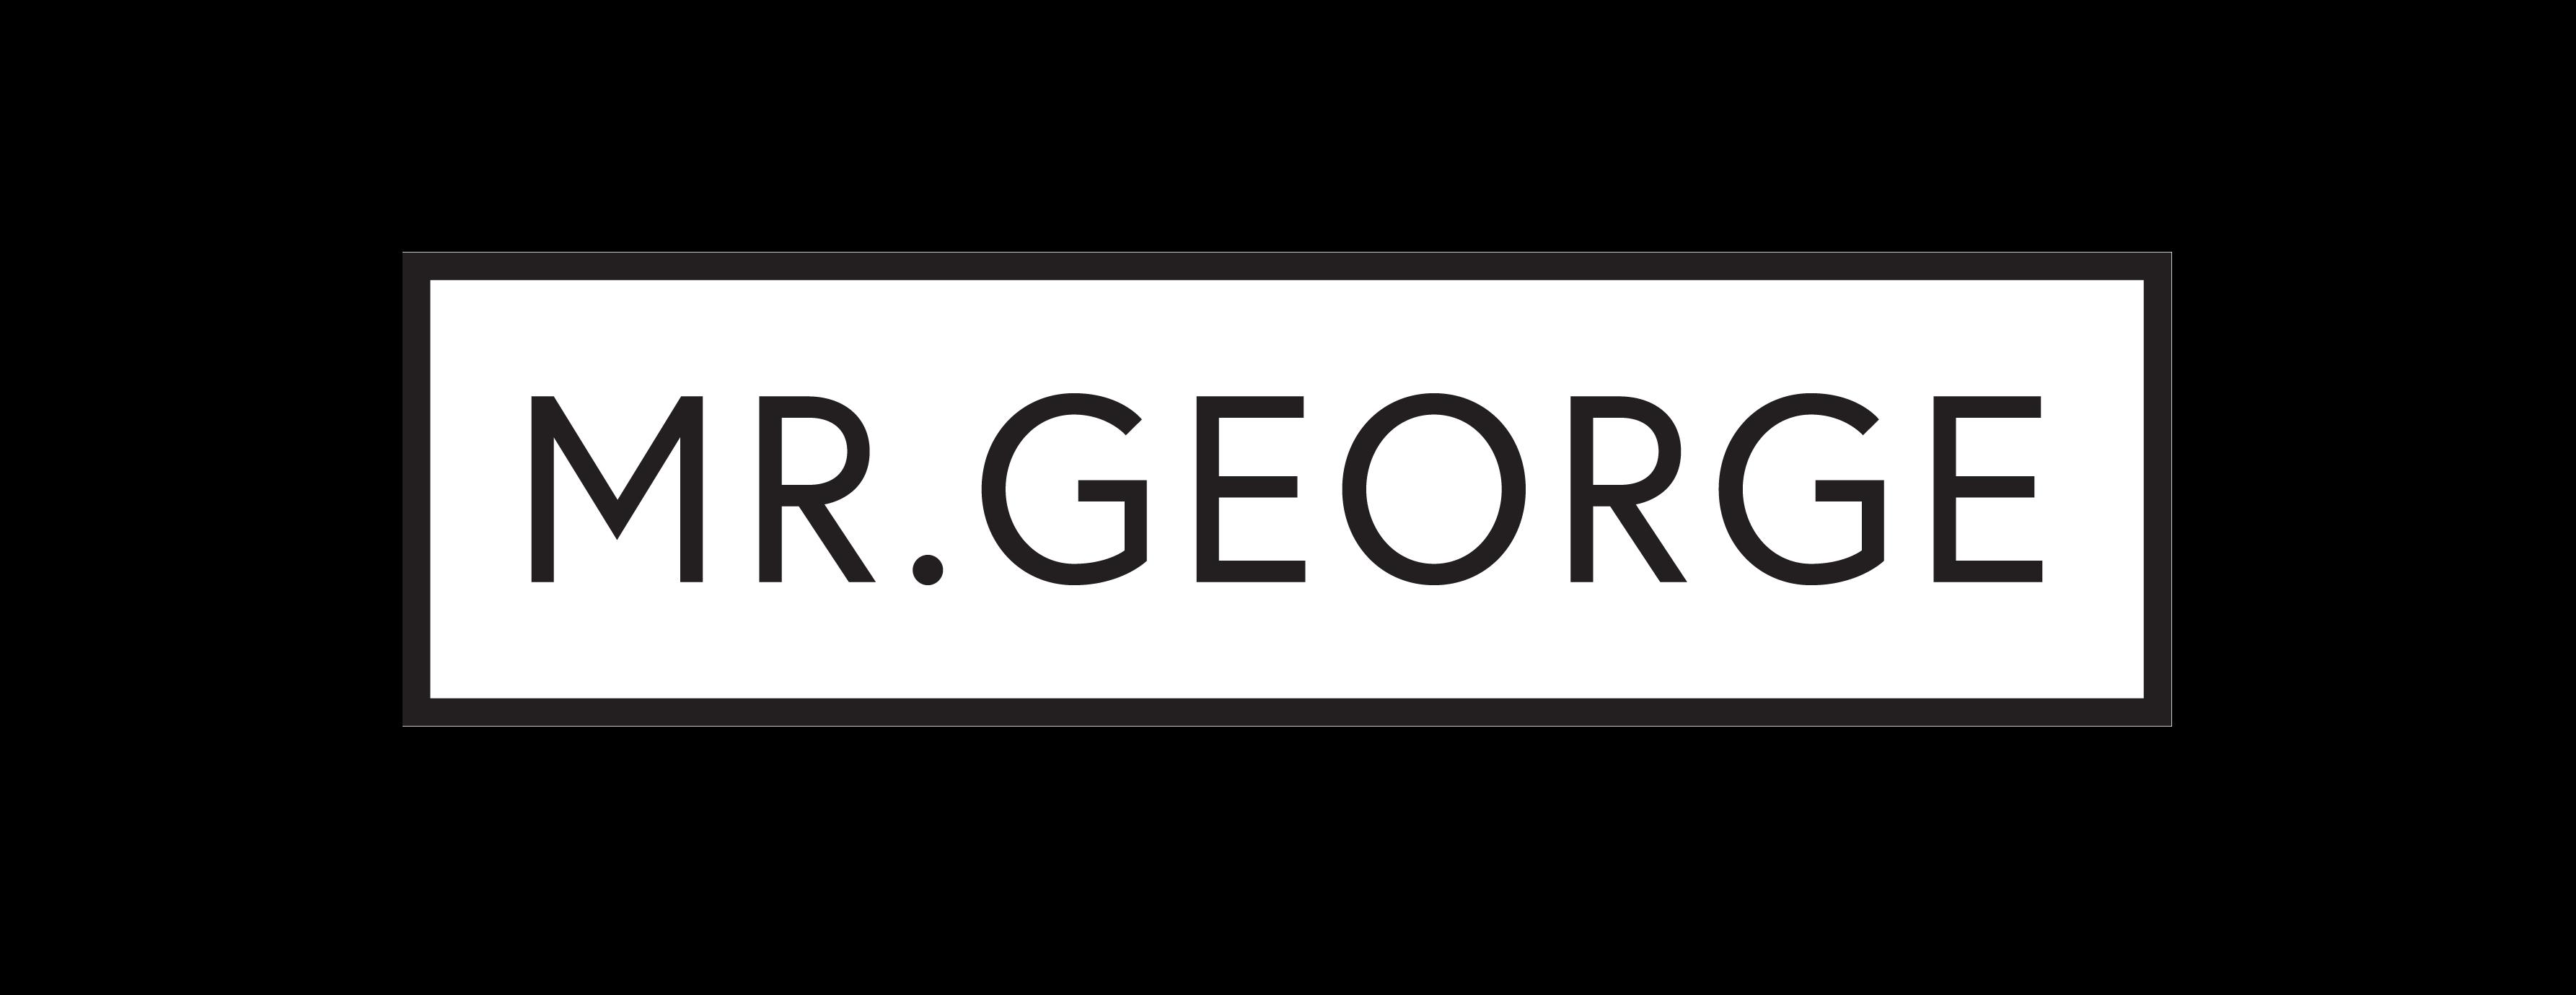 Mr George